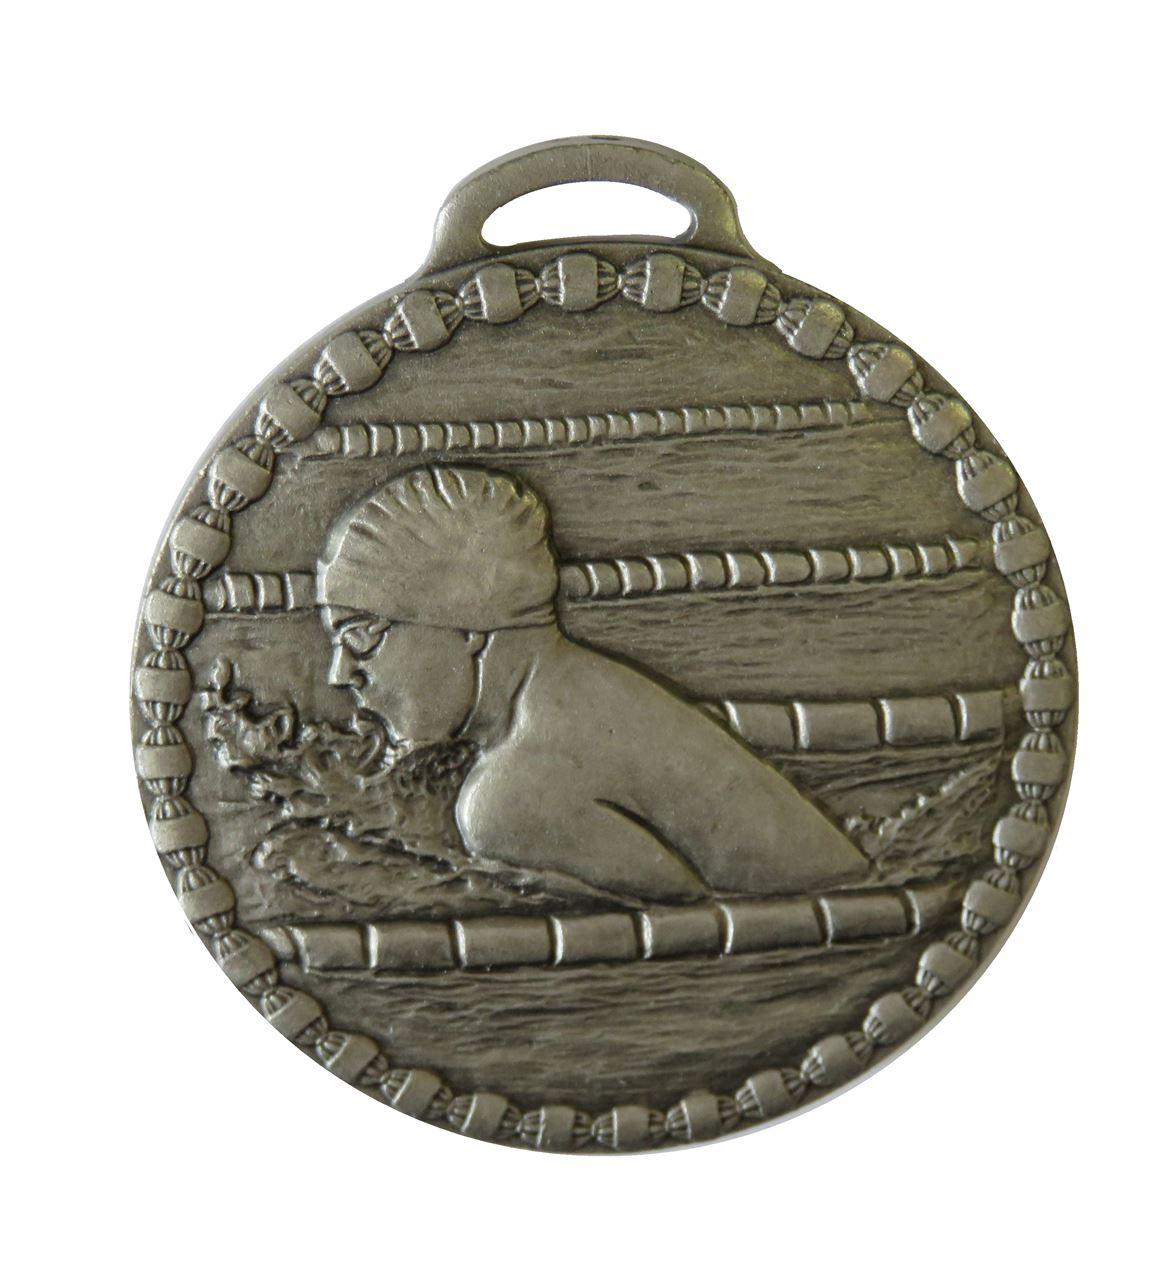 Silver Male Breaststroke Value Swimming Medal (size: 50mm) - 678E